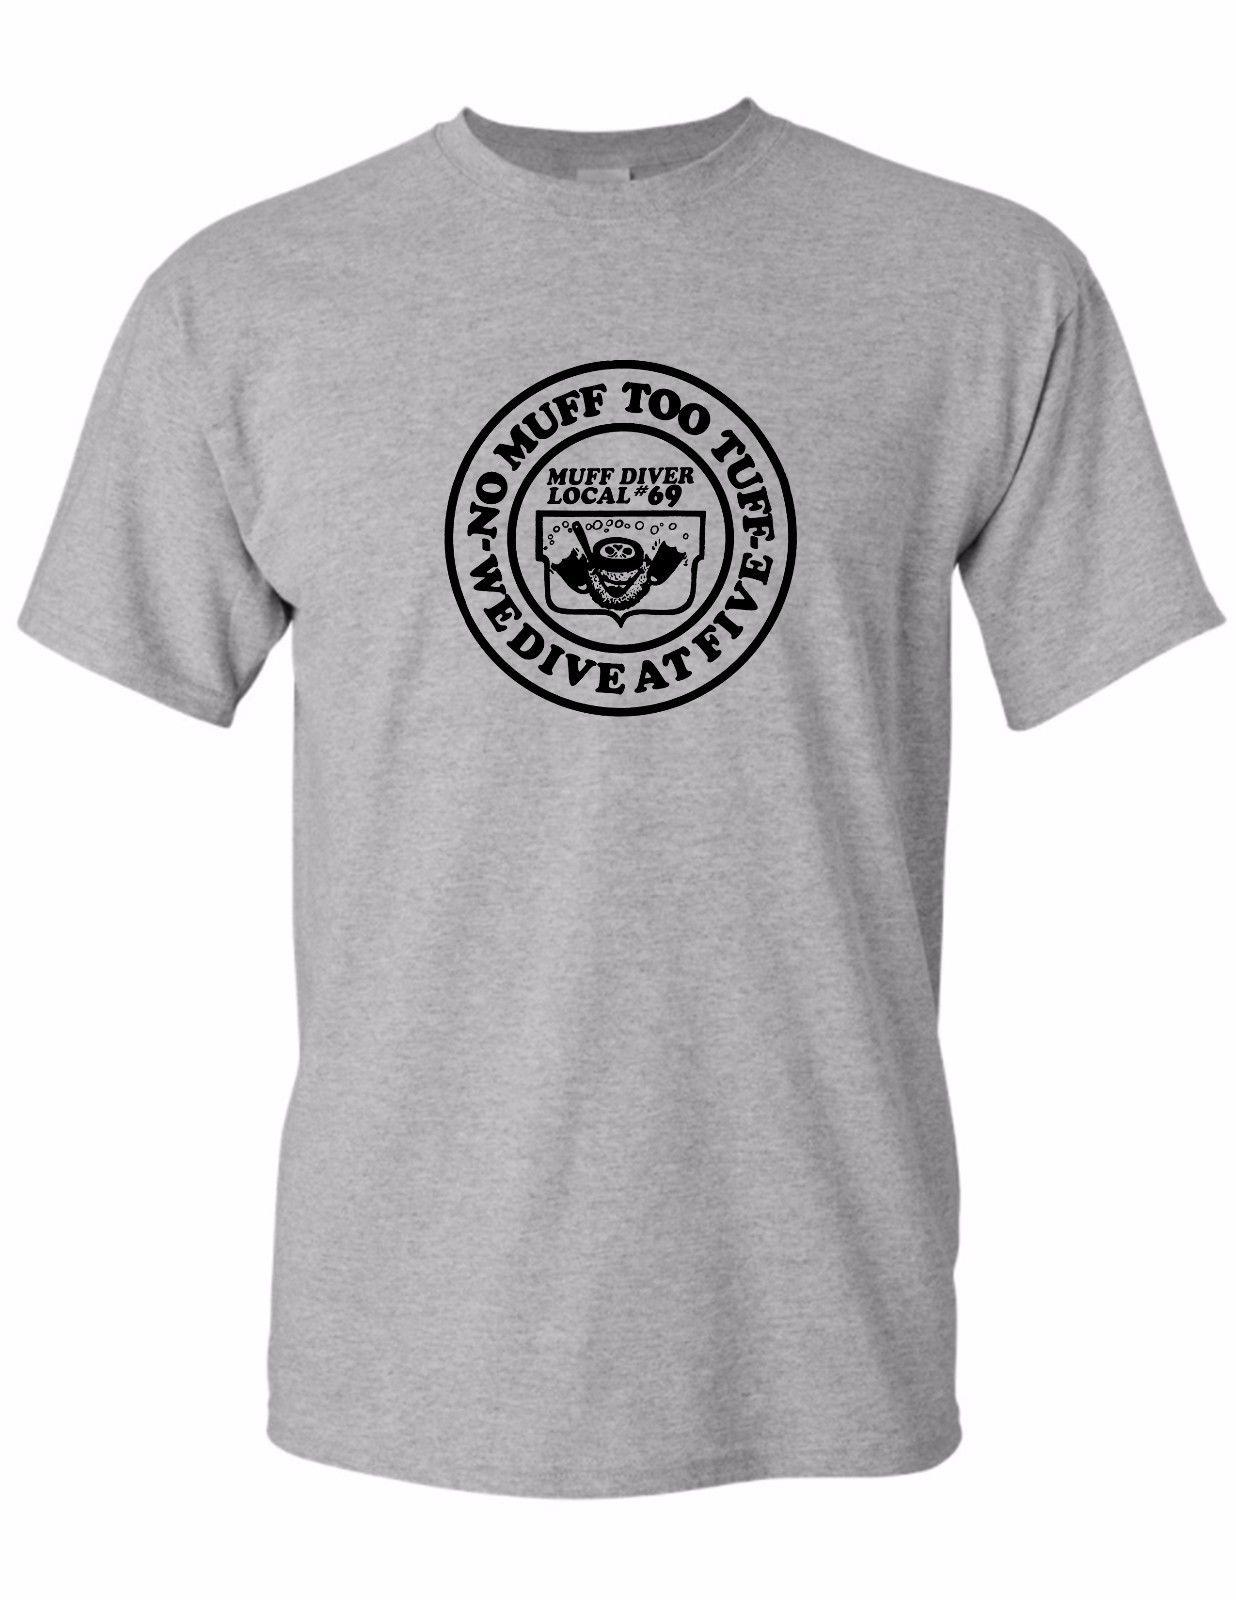 2018 Summer Cotton Tee Shirt Strange Cargo Tees Muff Diver Local #69 Funny Dirty Sex T-Shirt J31 Fashion T-shirt